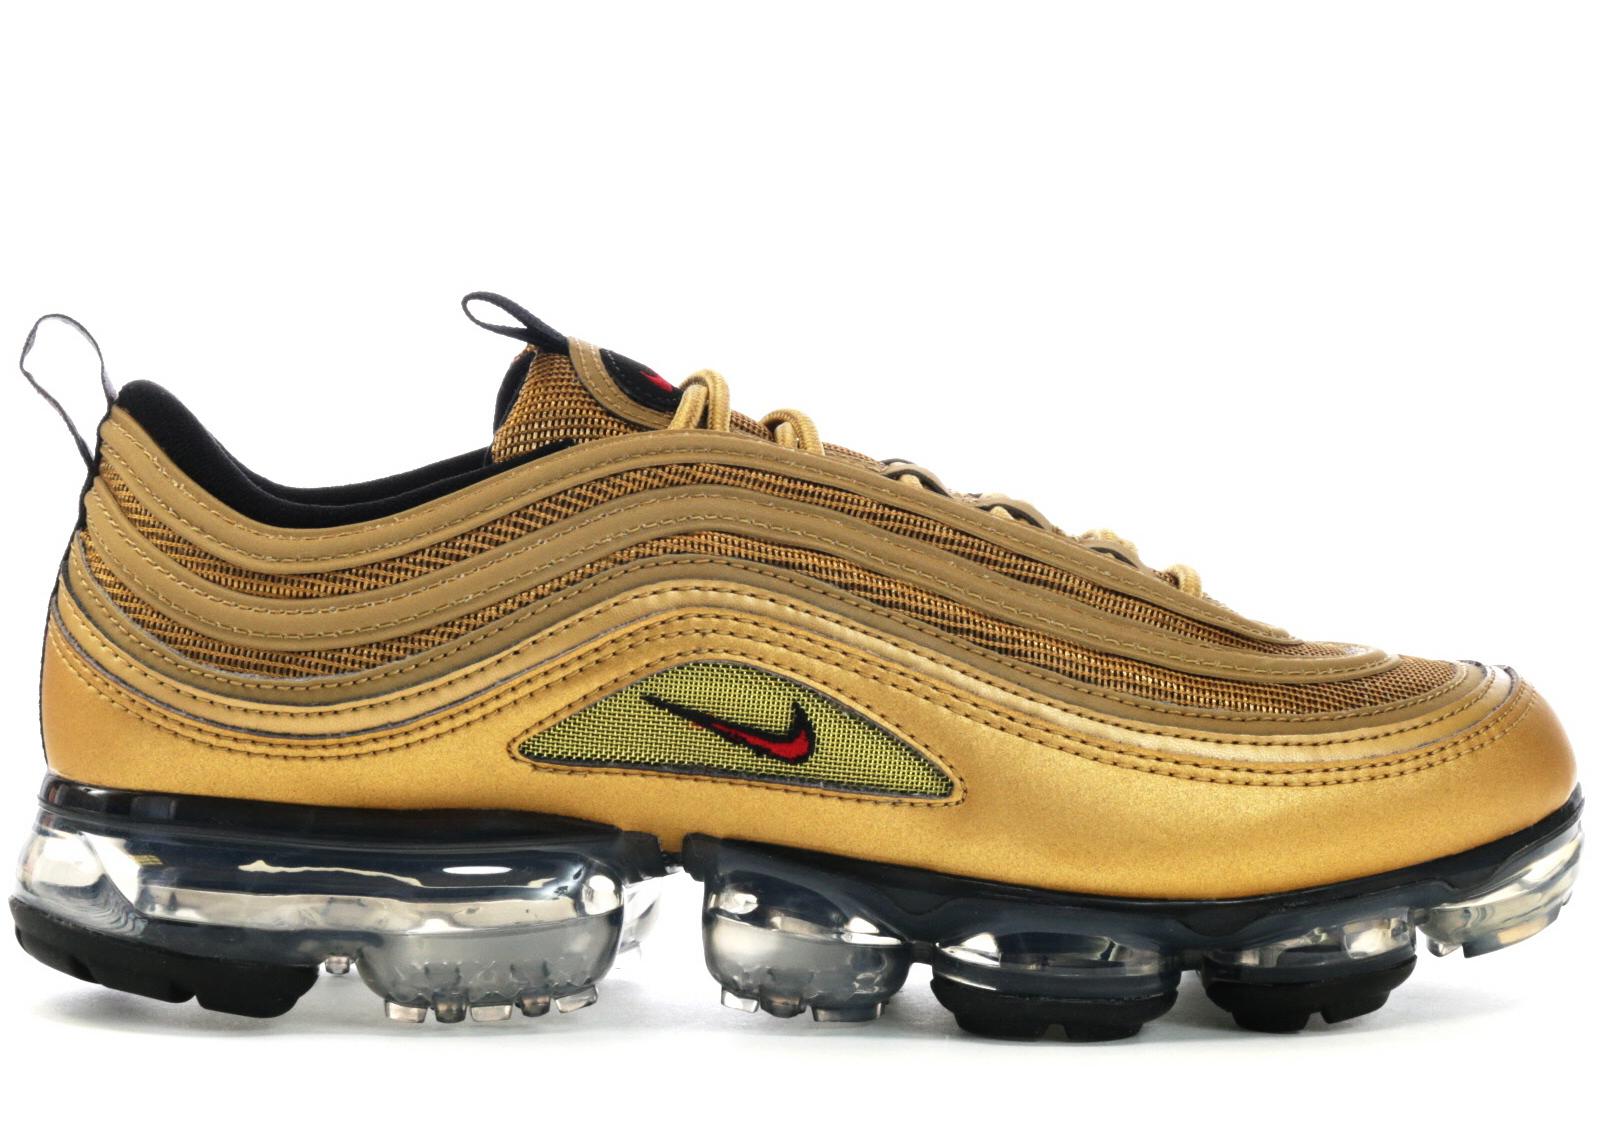 Nike Air VaporMax 97 Metallic Gold - AJ7291-700